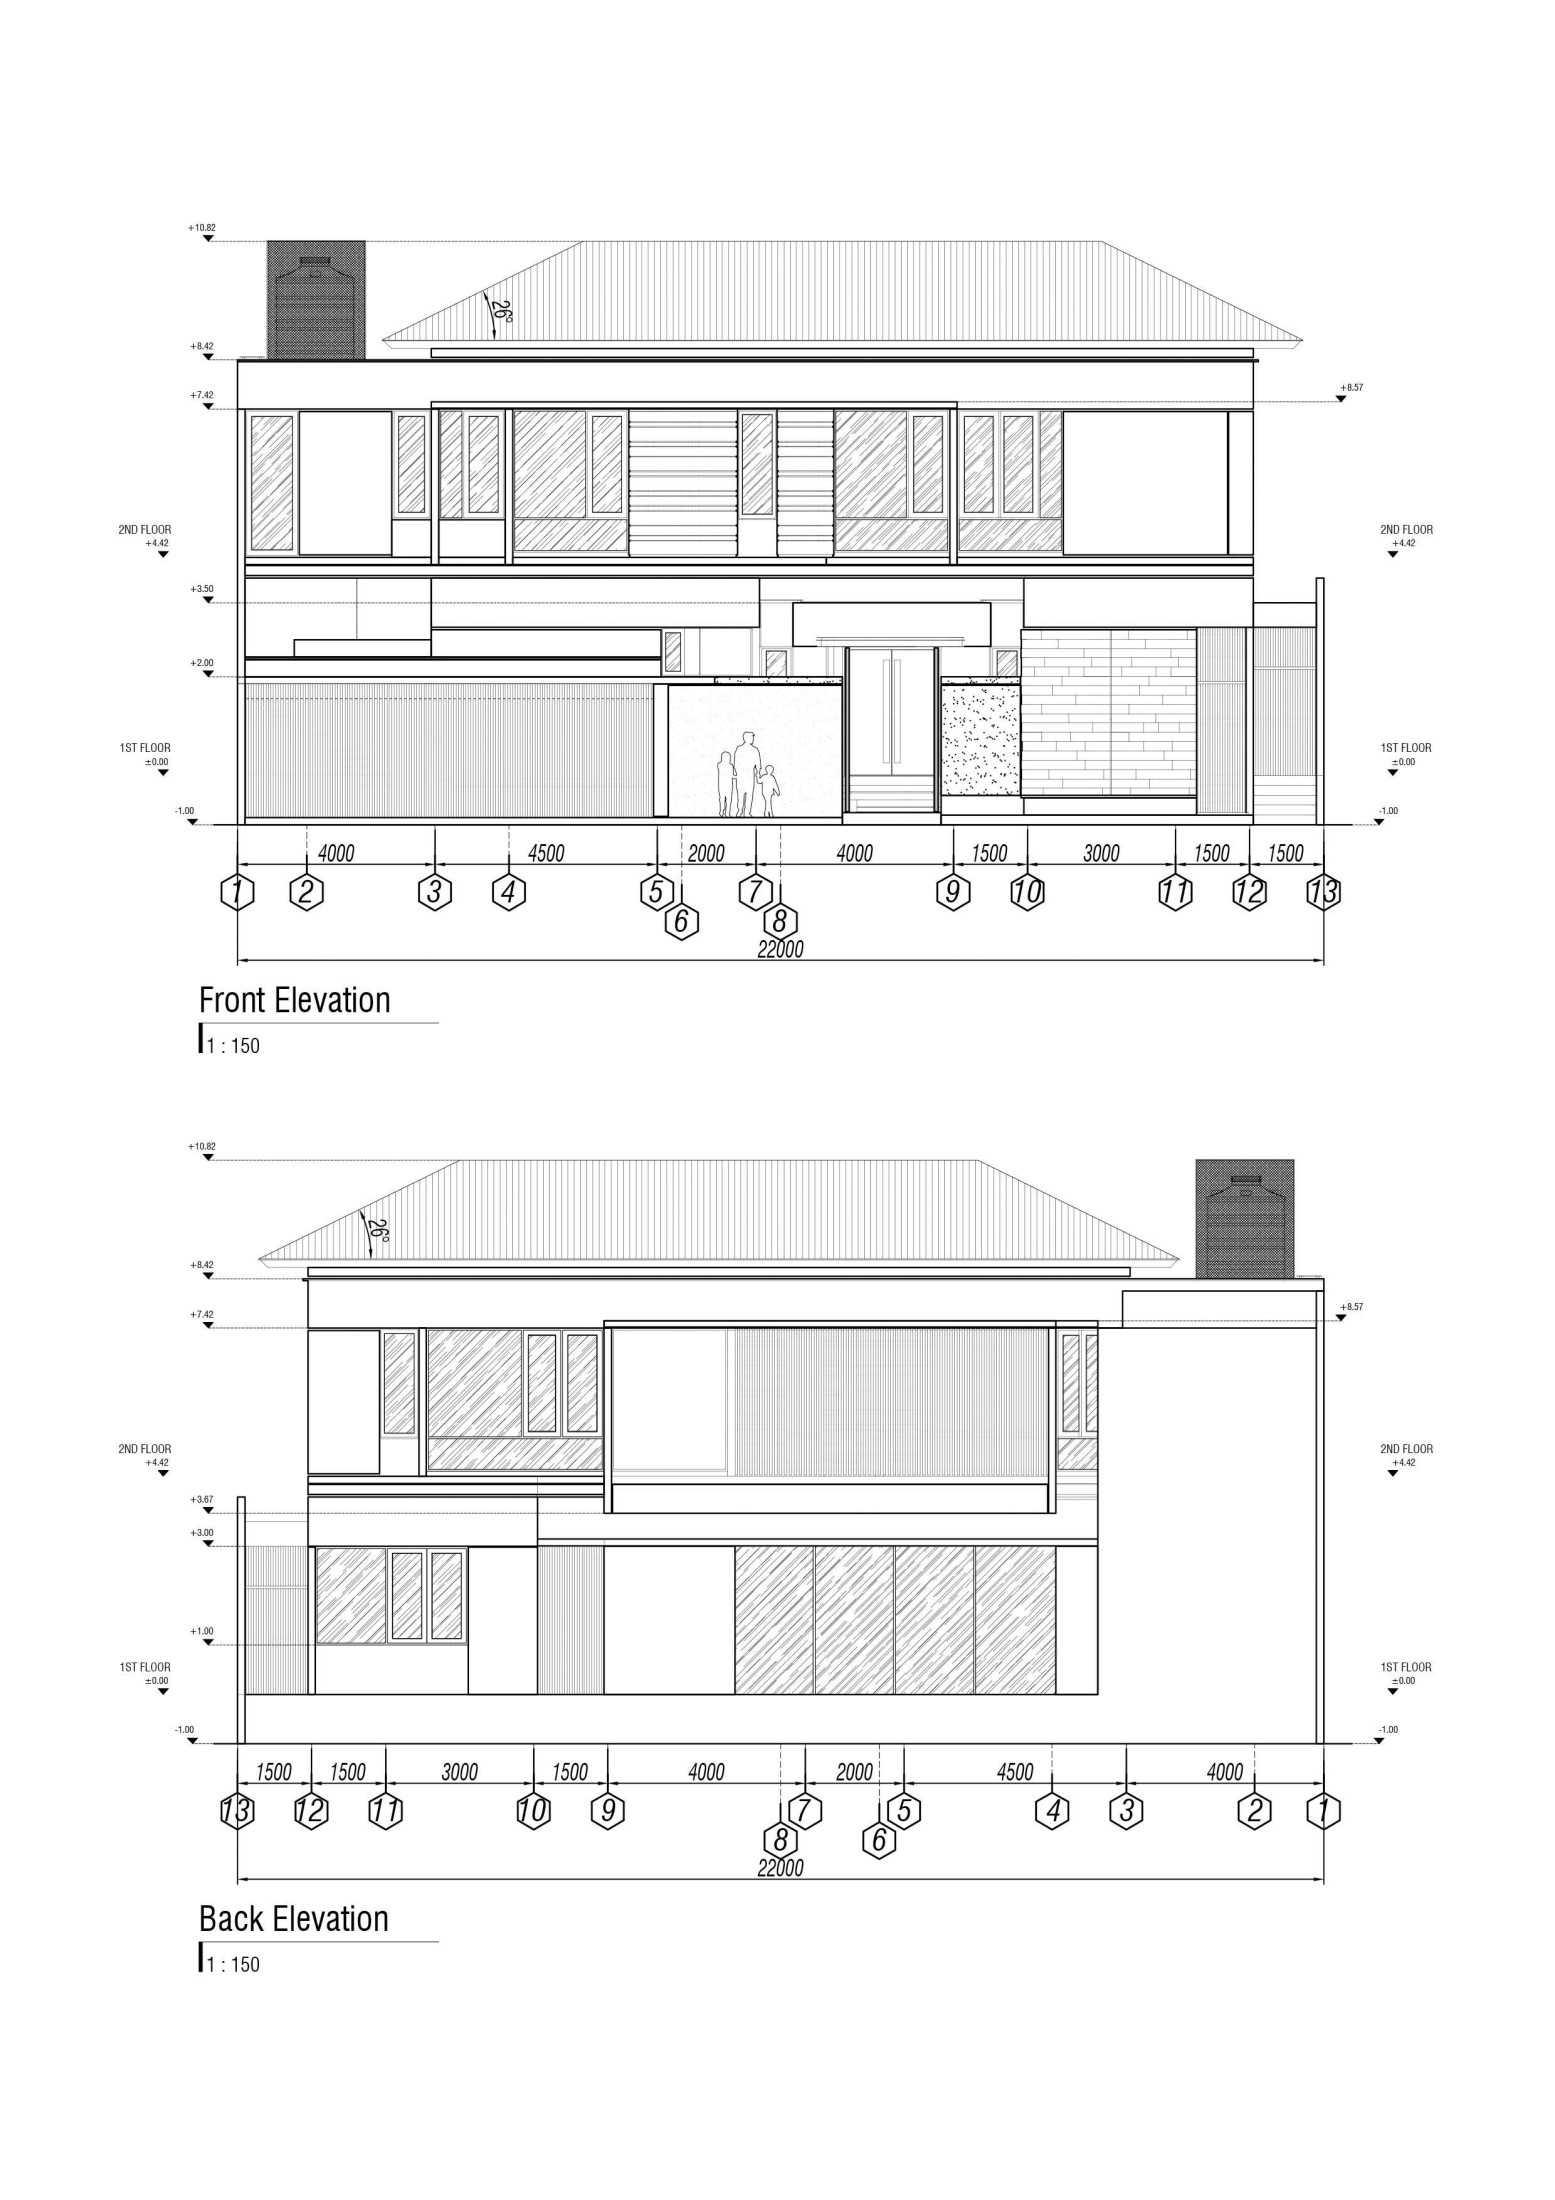 Y0 Design Architect S House Kec. Srono, Kabupaten Banyuwangi, Jawa Timur, Indonesia Kec. Srono, Kabupaten Banyuwangi, Jawa Timur, Indonesia Yohanes-Iswara-Limandjaya-S-House  121100